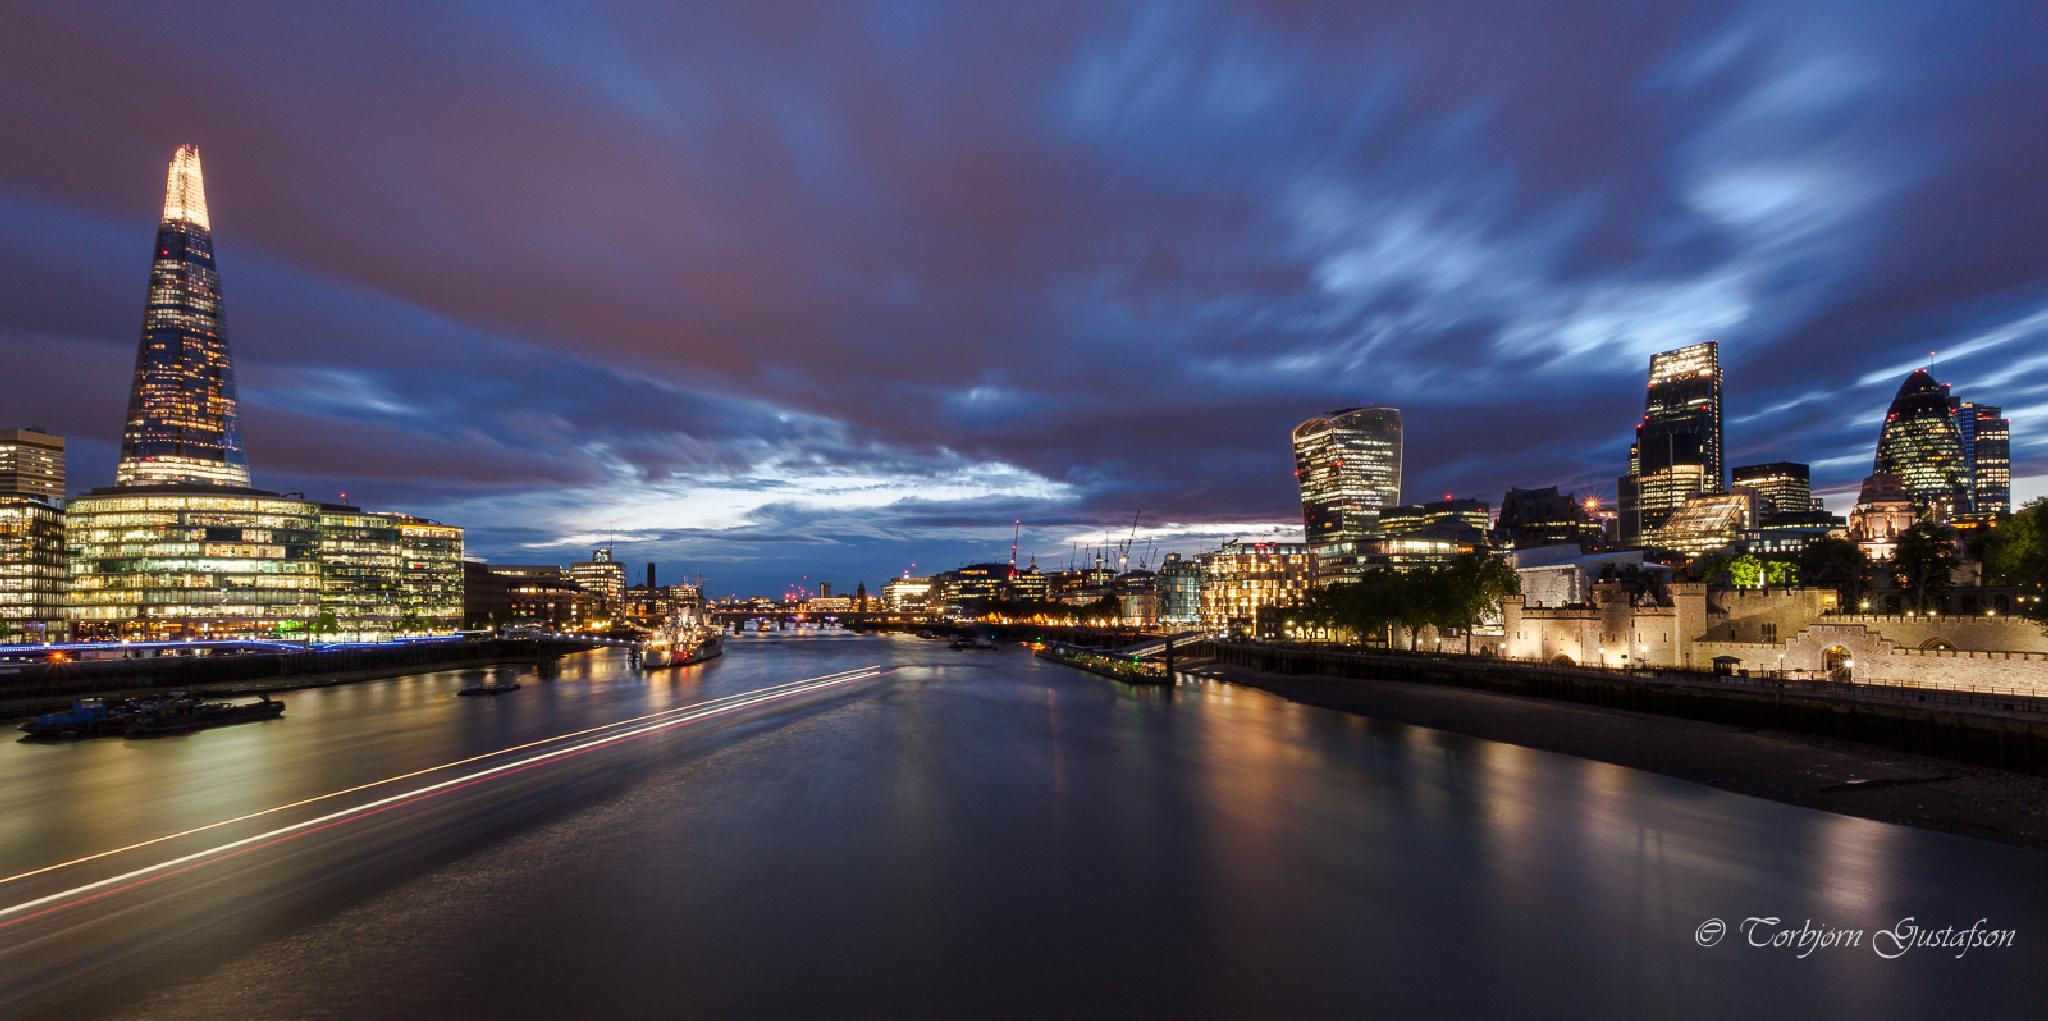 30 seconds of London by Torbjørn Gustafson